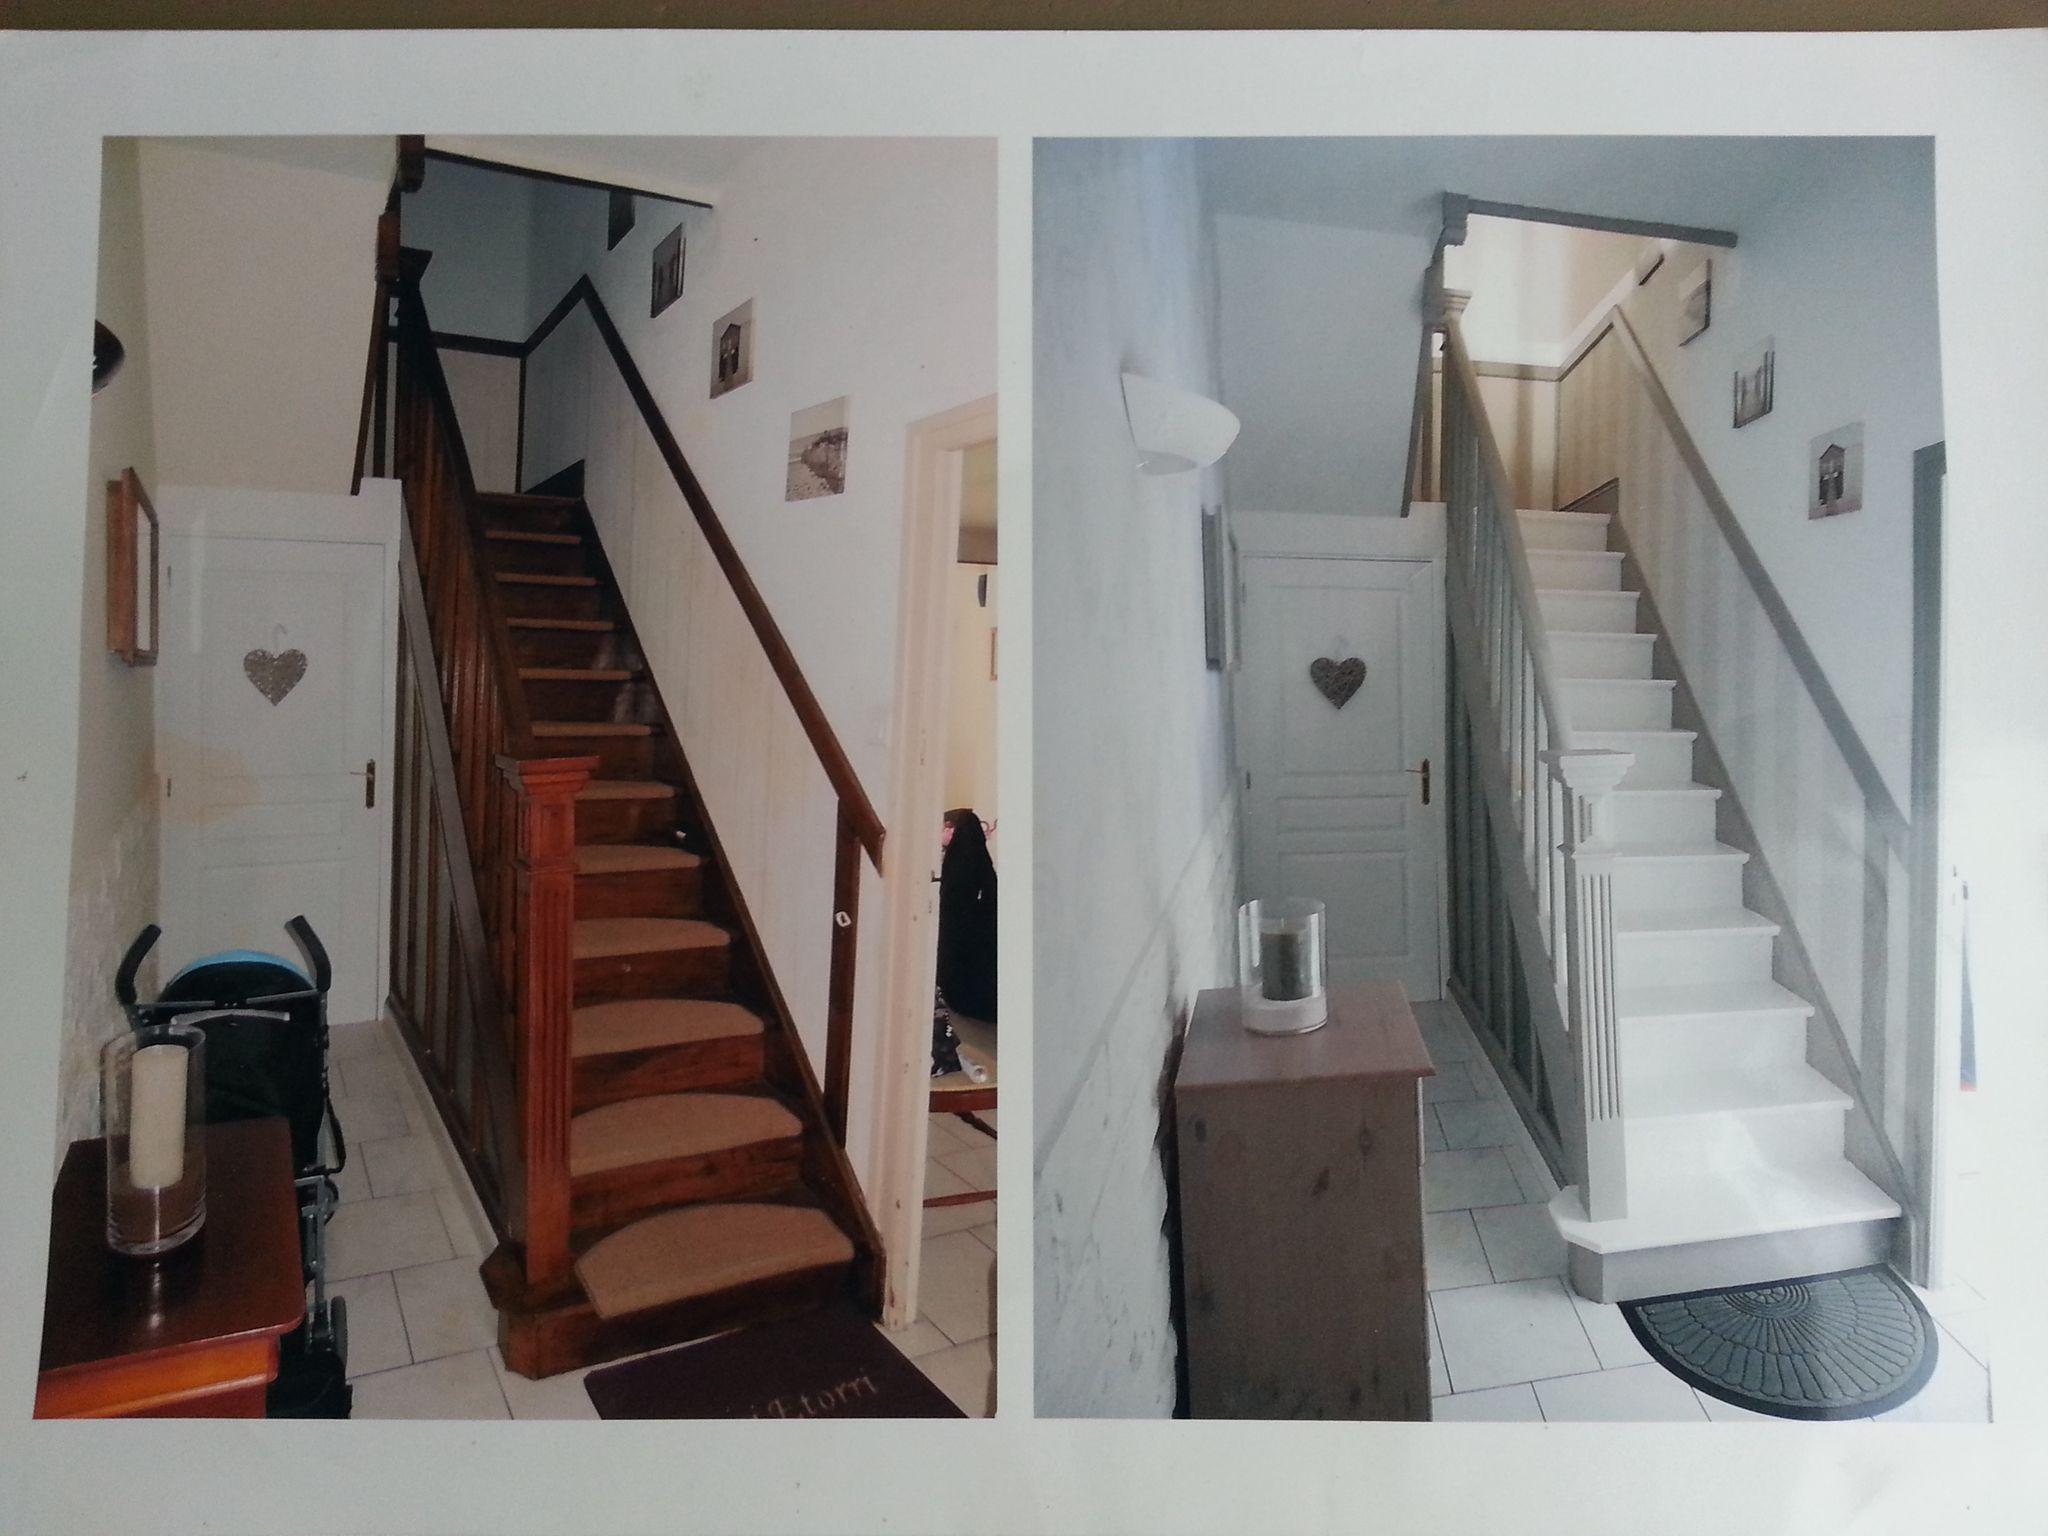 escalier eleonore deco deco pinterest peindre escalier bois eleonore deco et escalier bois. Black Bedroom Furniture Sets. Home Design Ideas